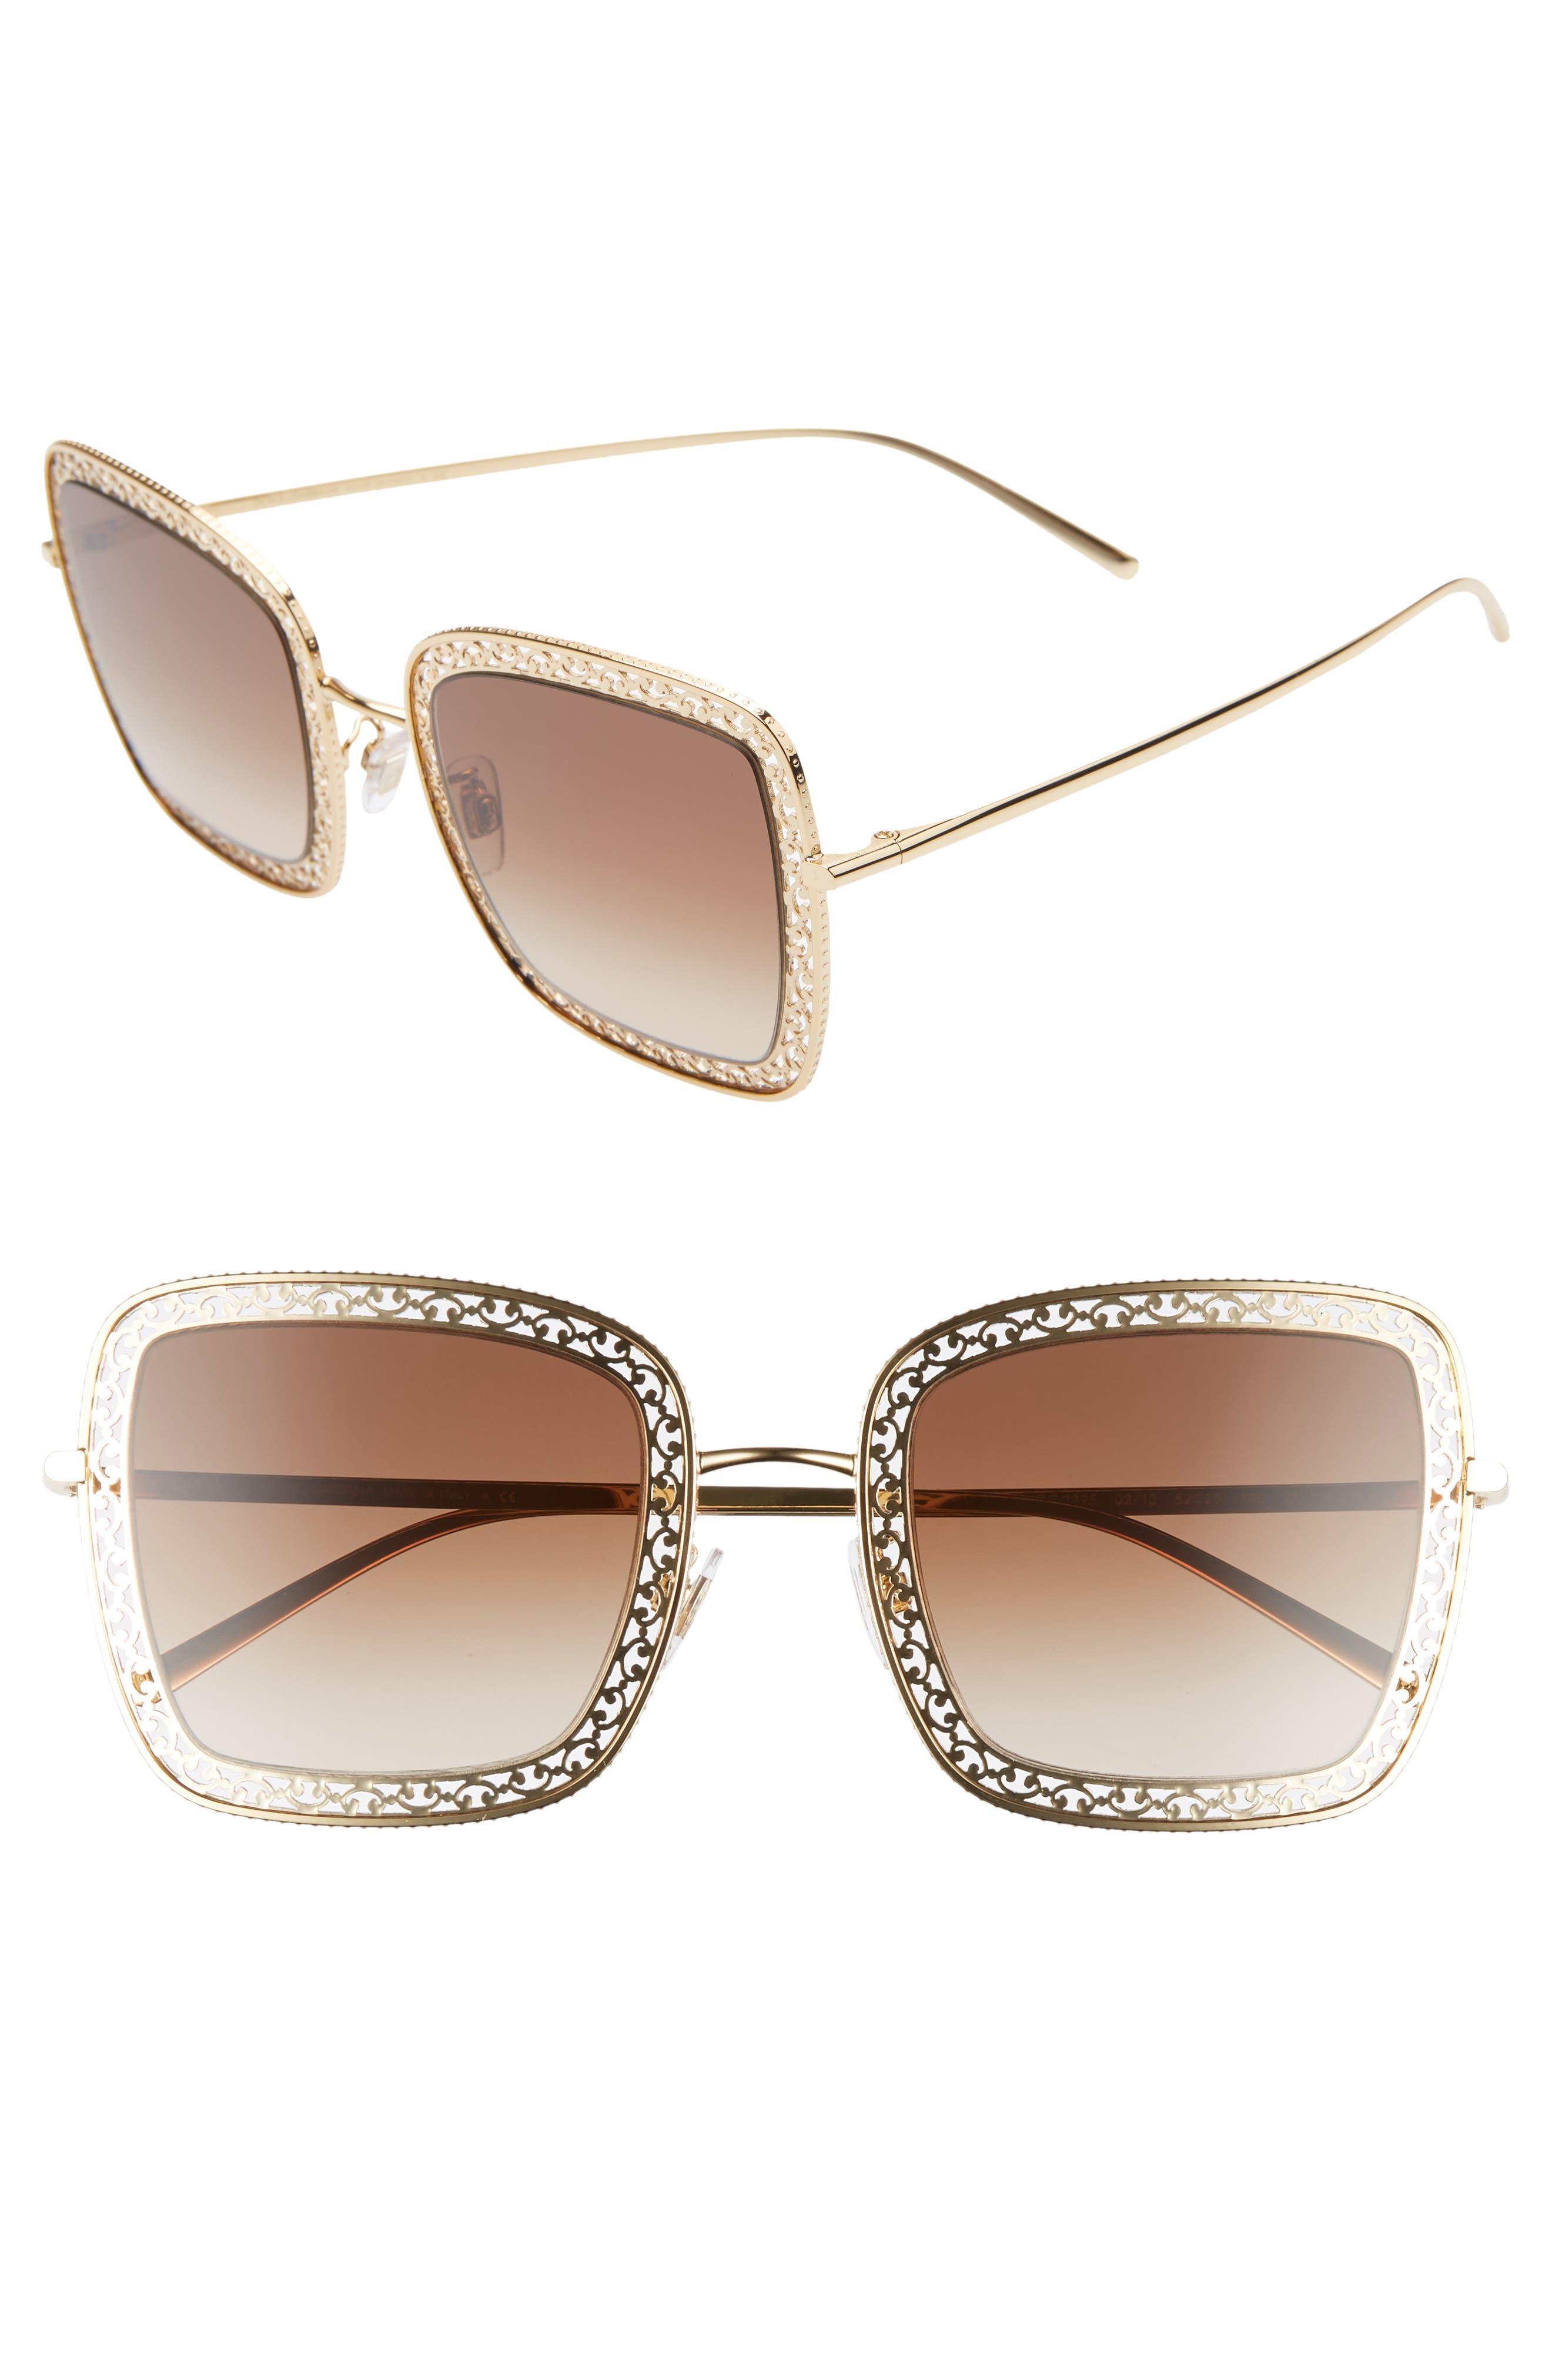 Dolce & gabbana 52Mm Square Sunglasses - Gold/ Brown